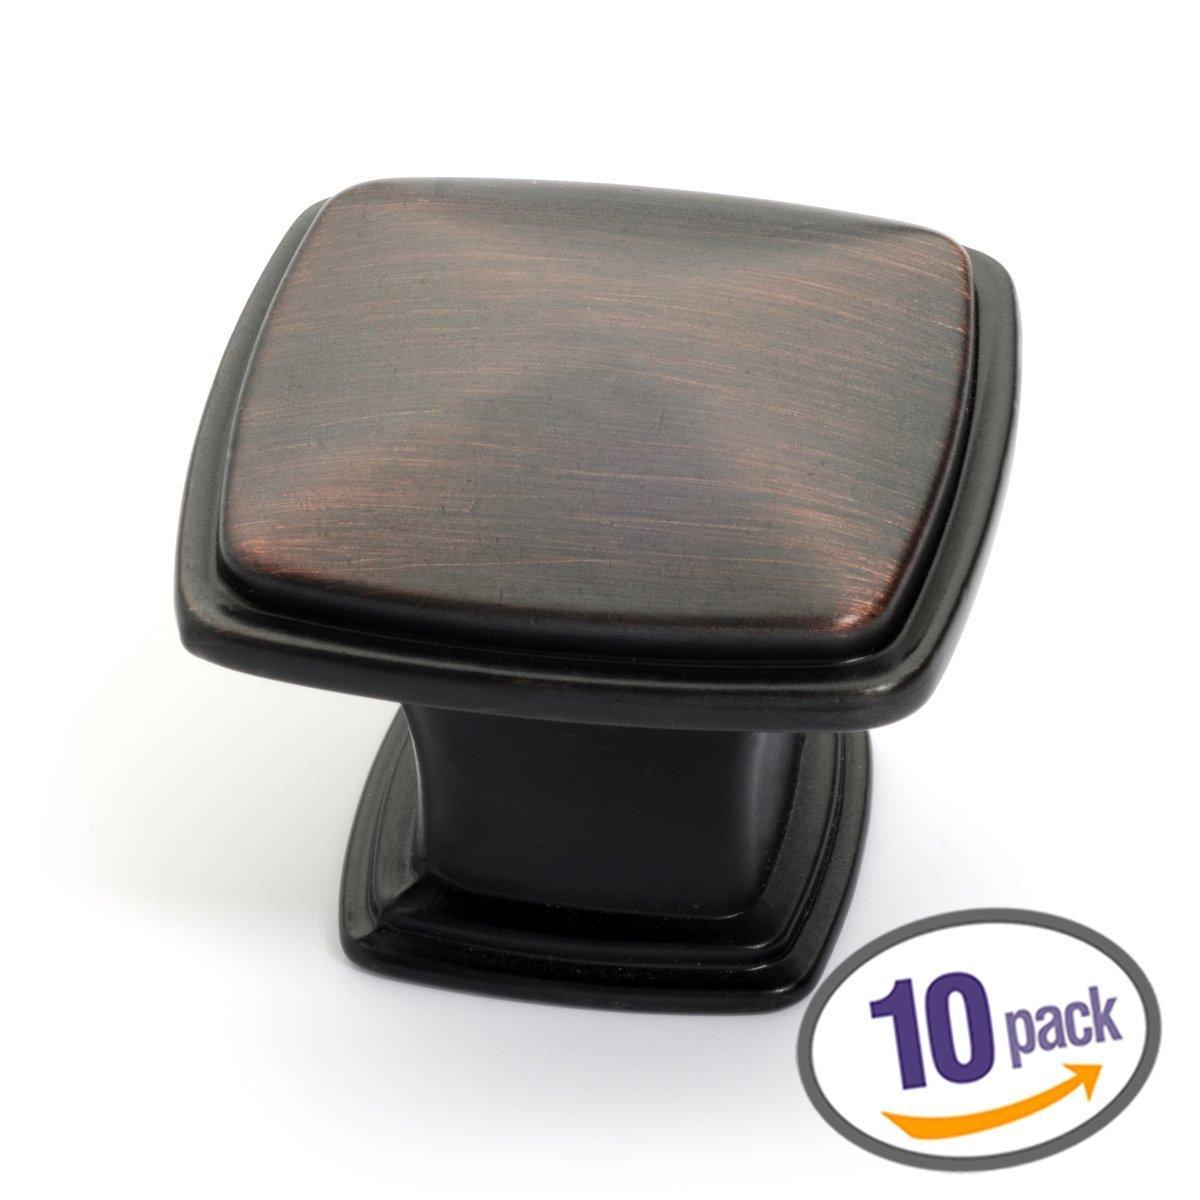 Dynasty Hardware K-81091-10B-10PK Cabinet Hardware 1-1/4-Inch Square Knob, Oil Rubbed Bronze, 10-Pack